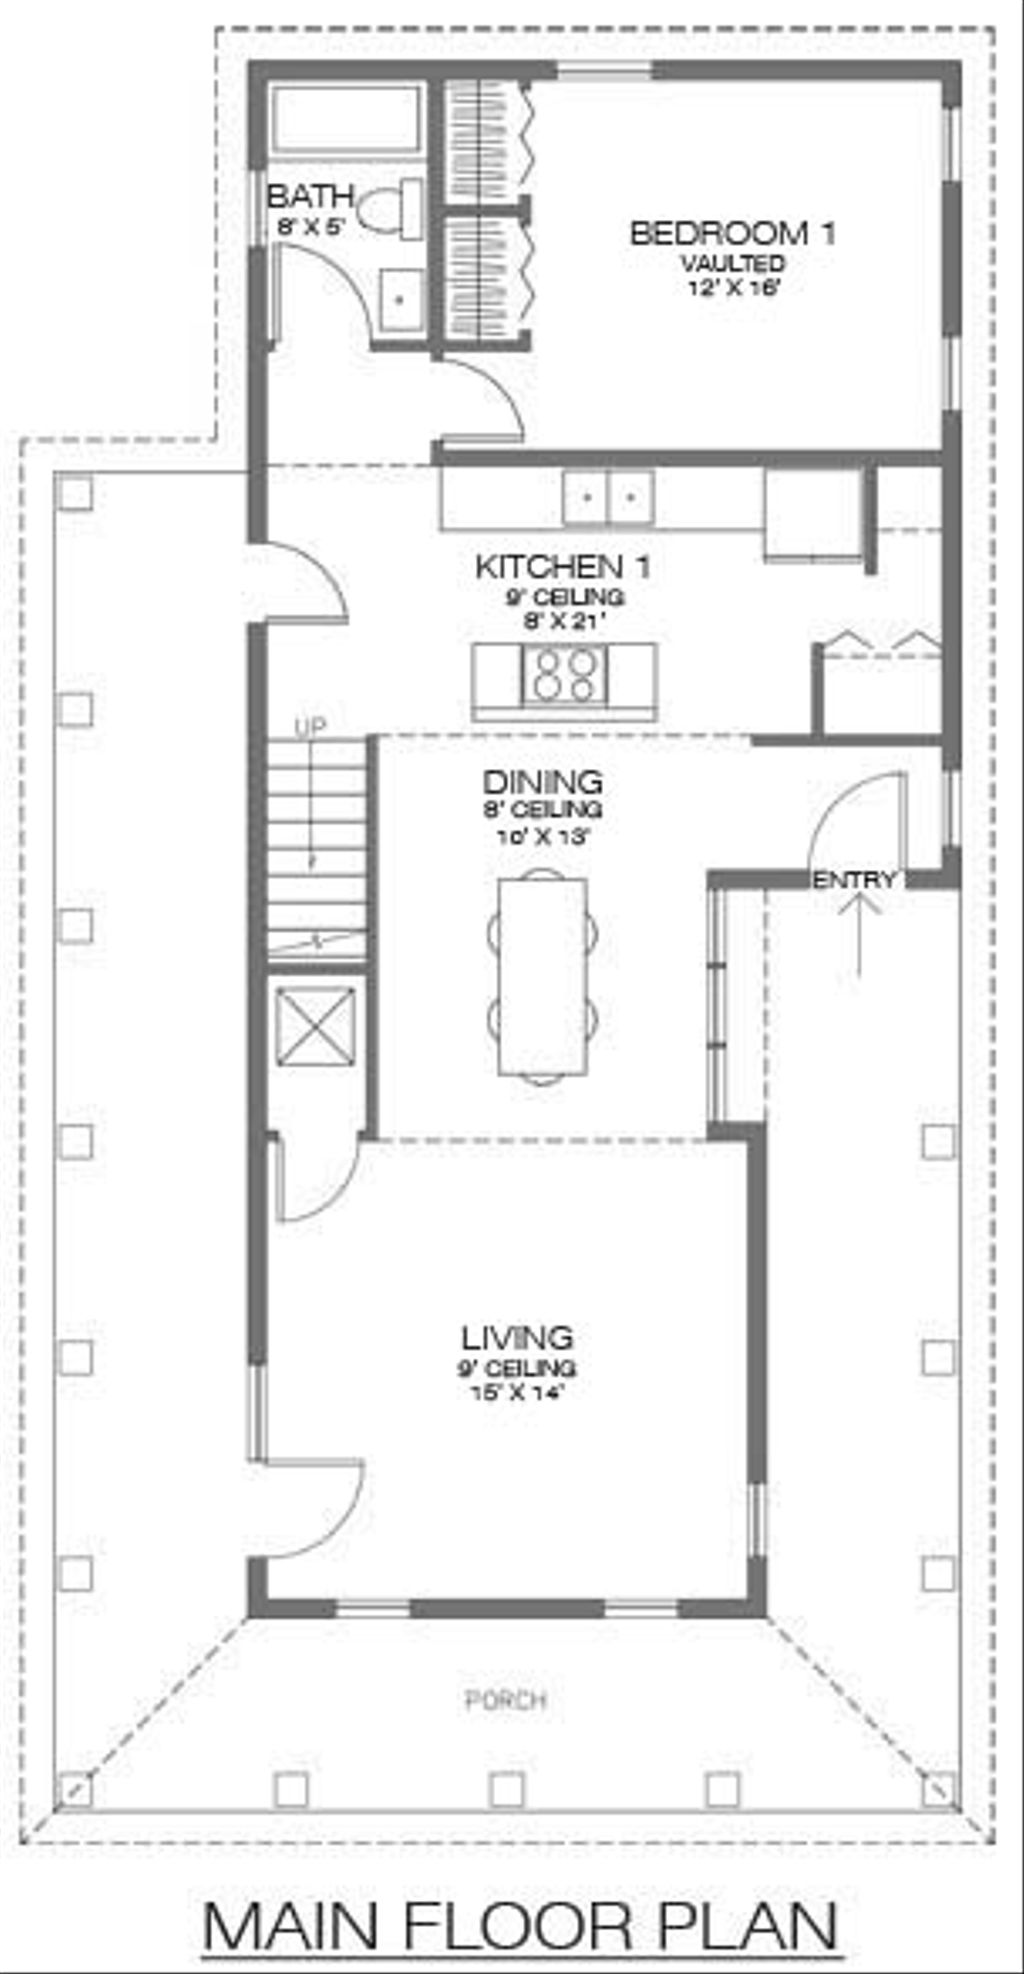 Farmhouse style house plan 3 beds 2 baths 1366 sq ft plan 486